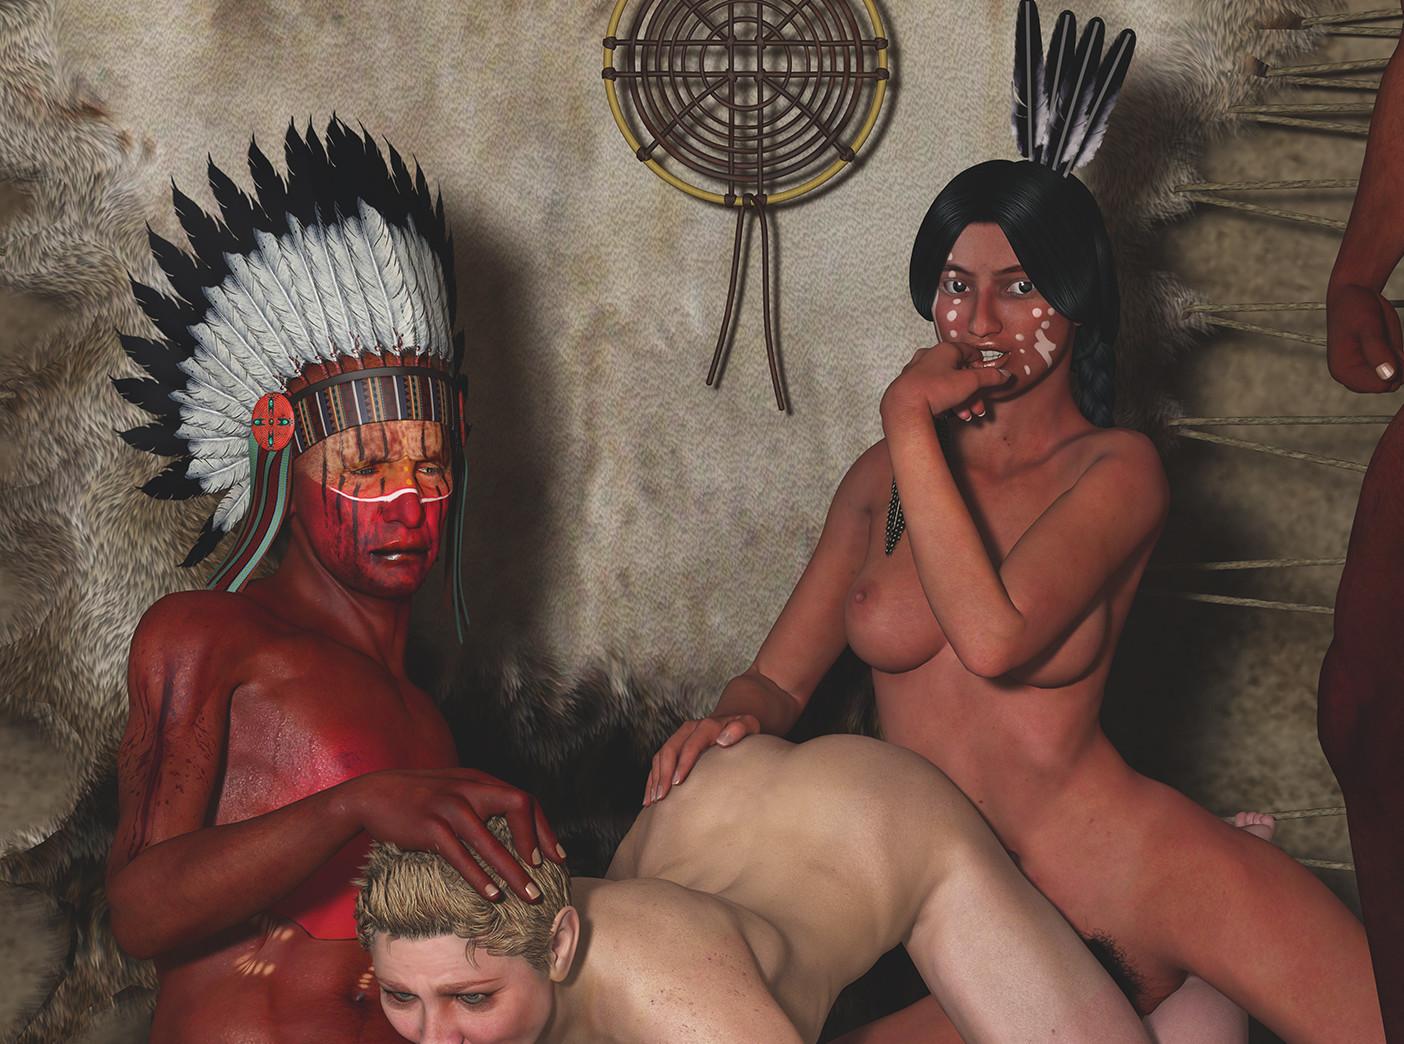 государство, порно с индейскими племенами видео шапке